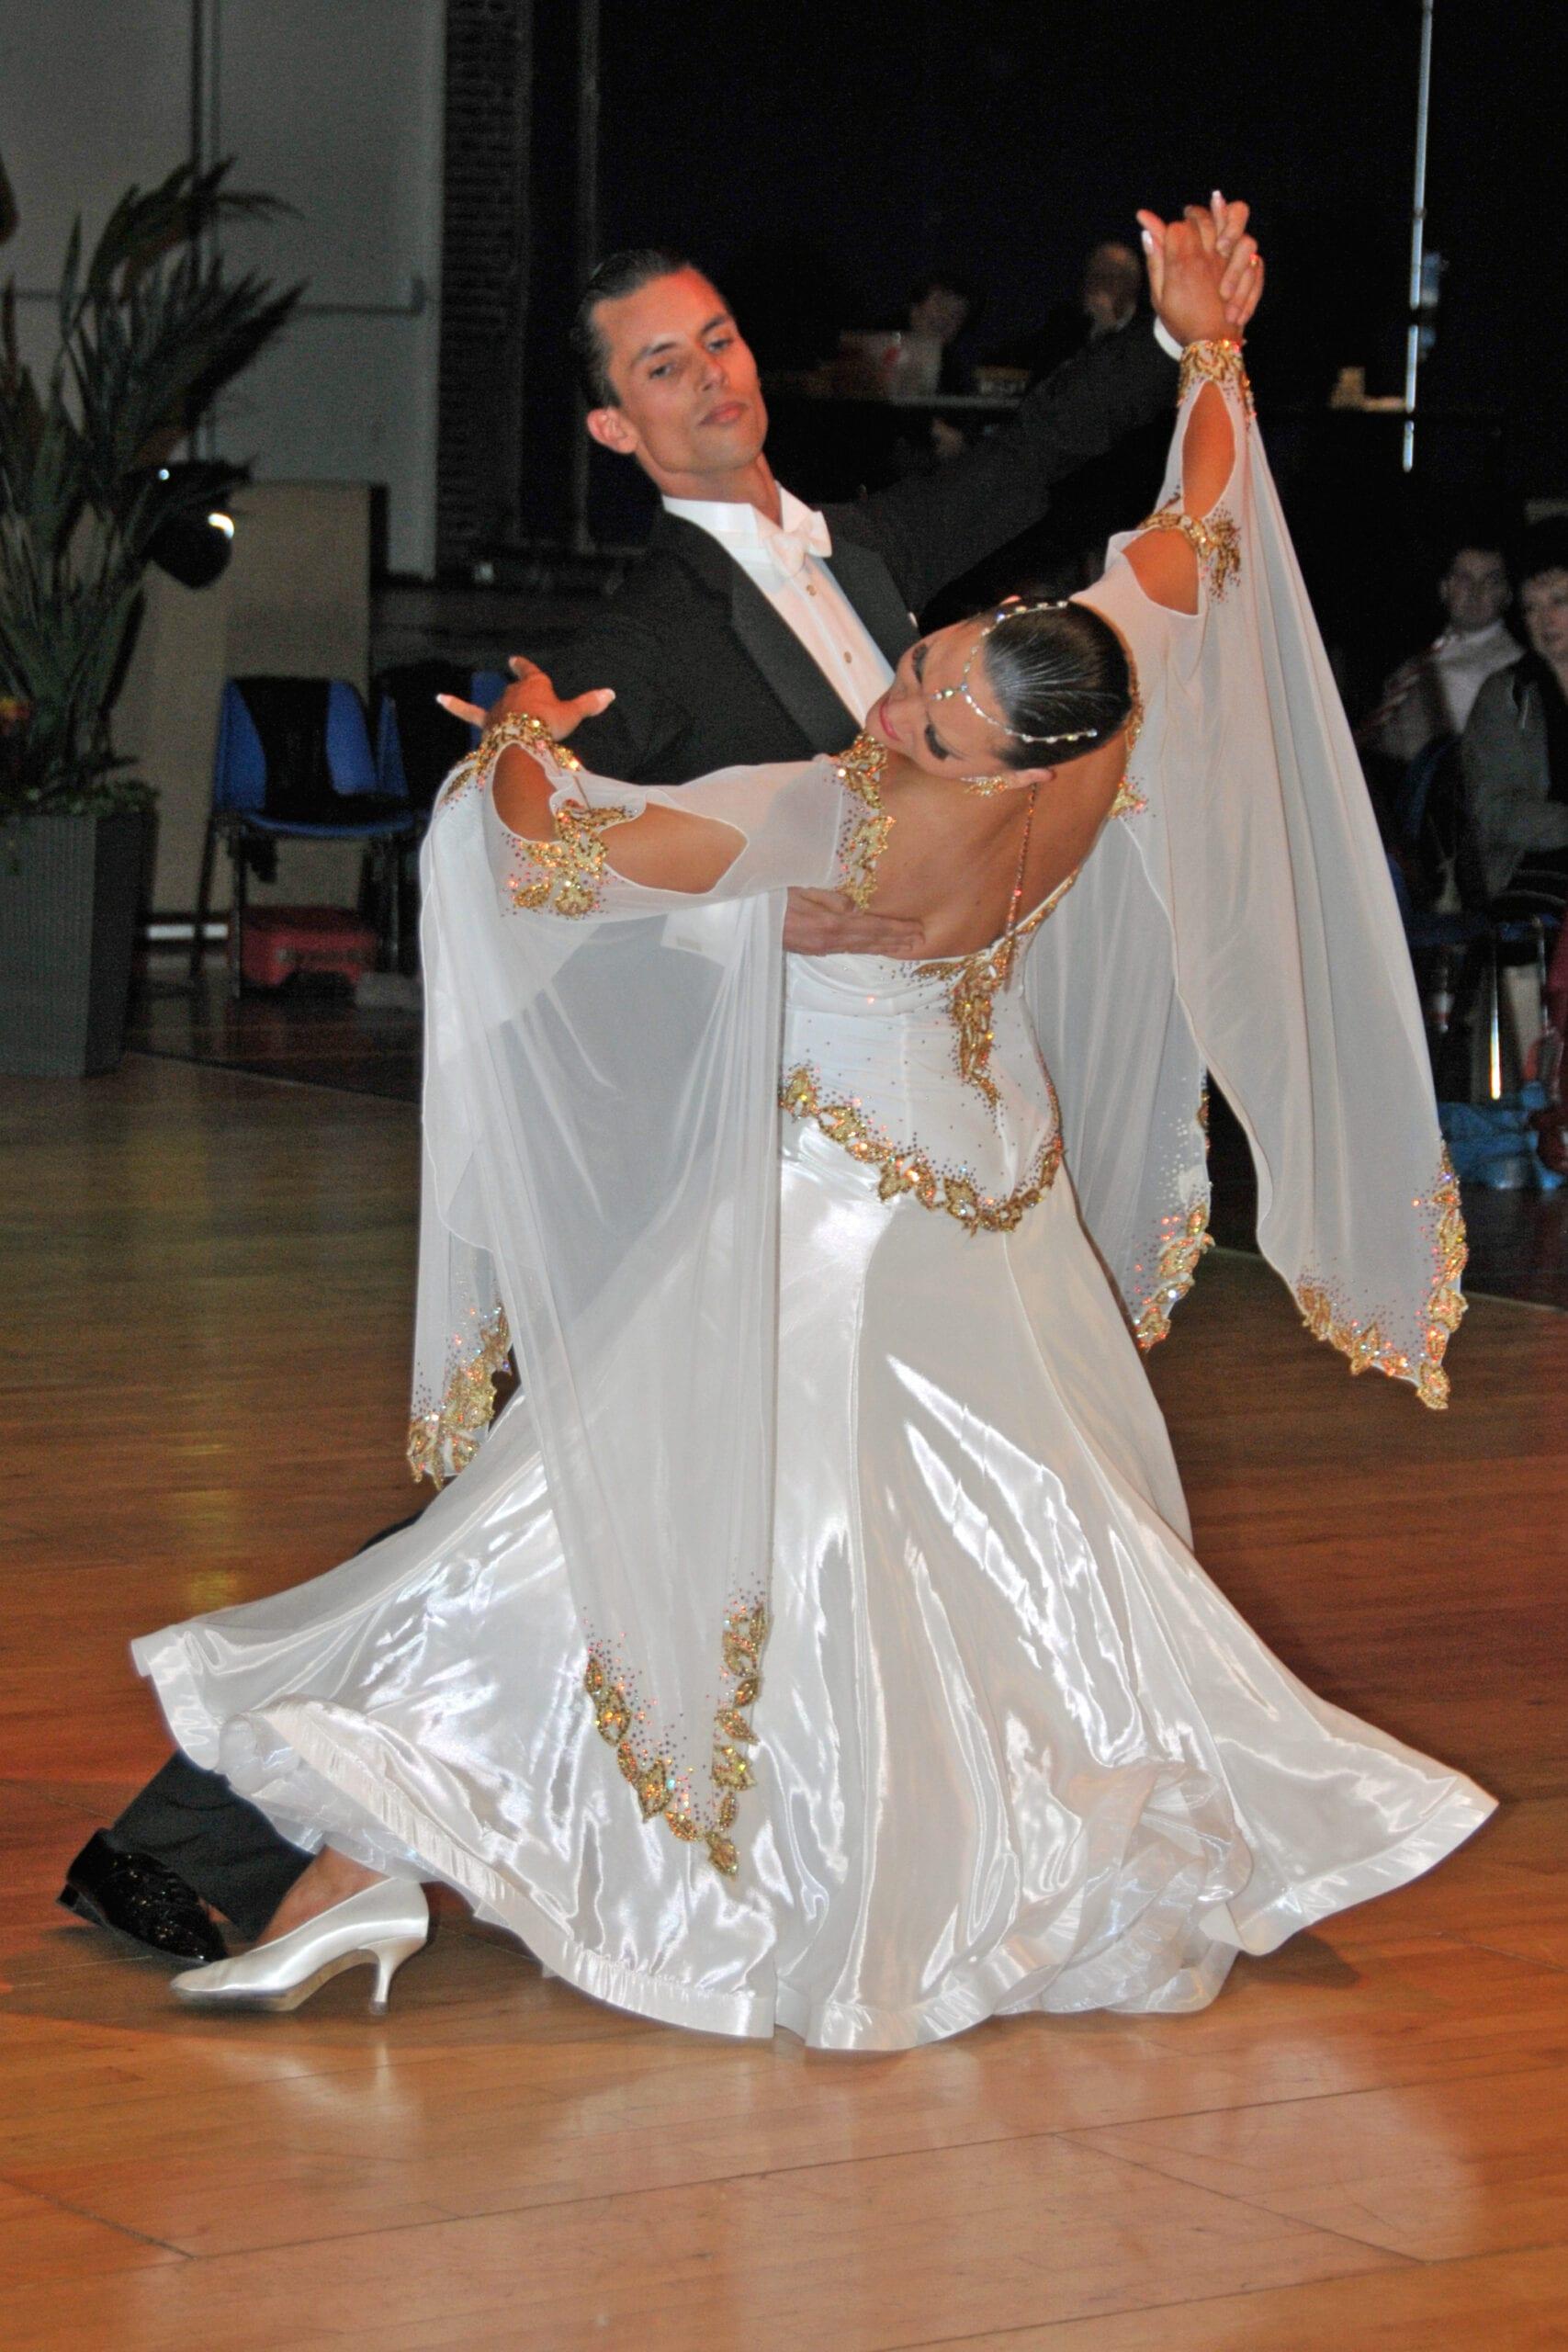 Dansstudio Isashi Isao Wolvekamp en Shirley Benton